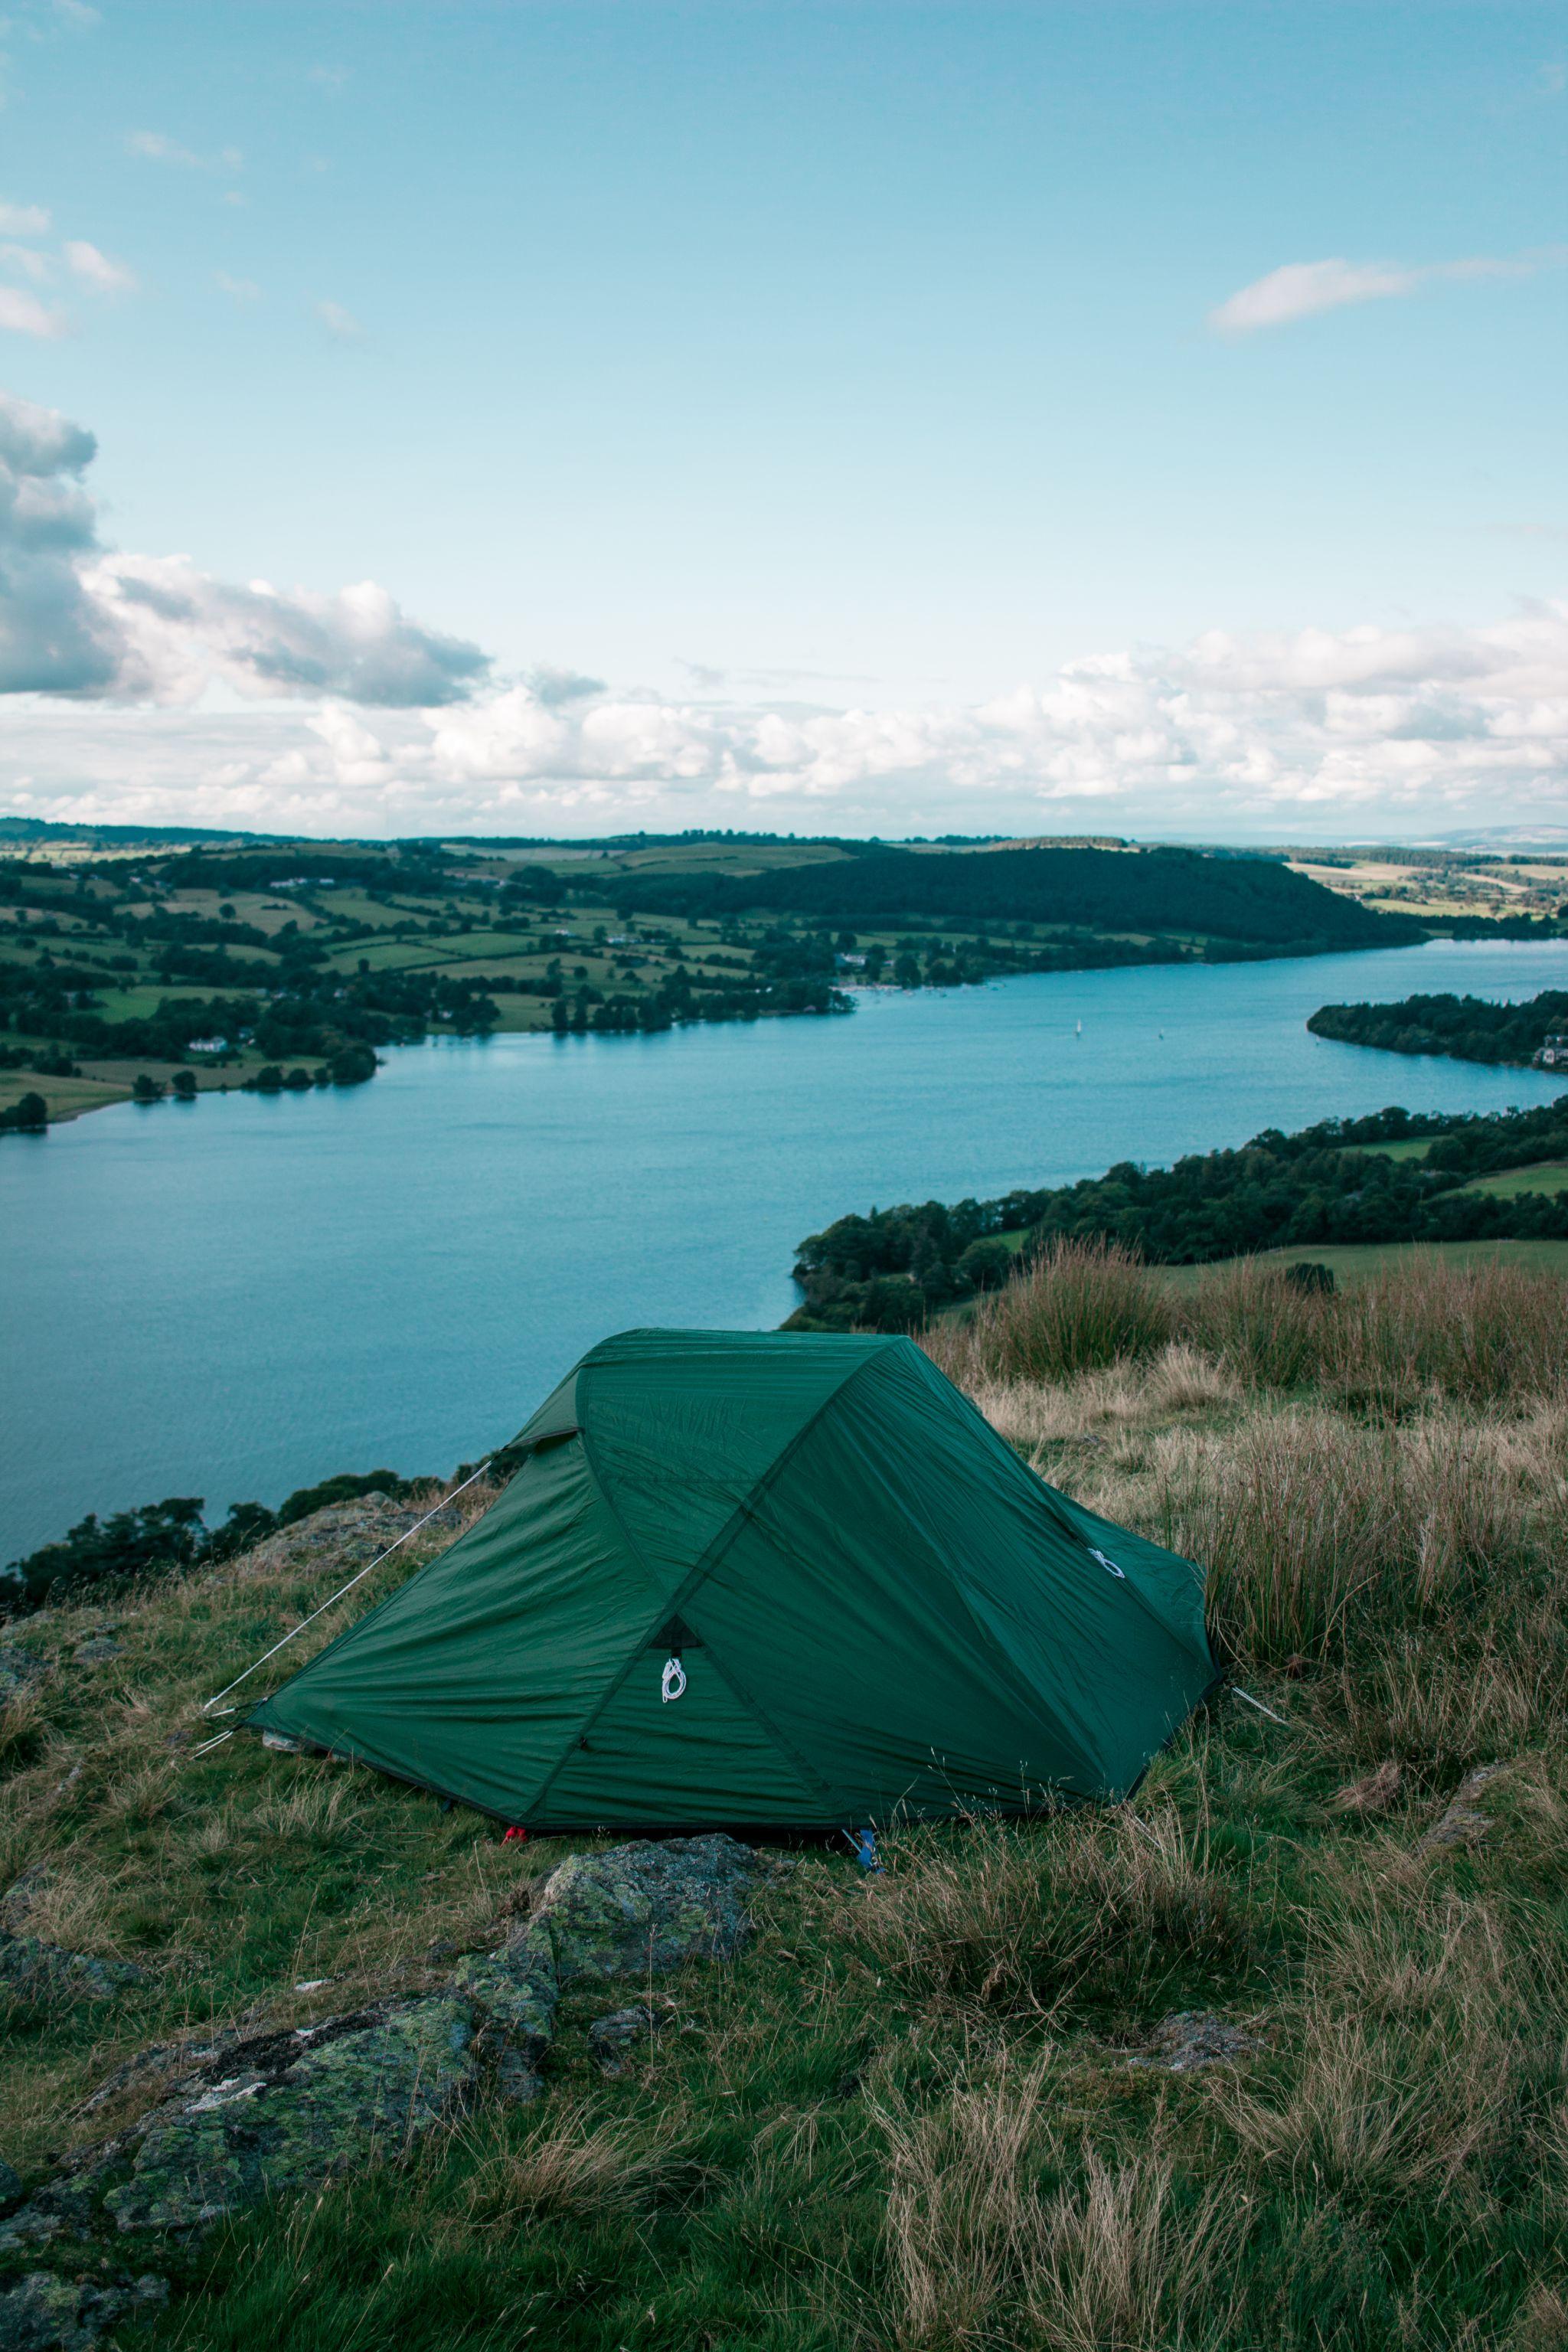 wild-camping-guide-lake-district-terra-nova-tent